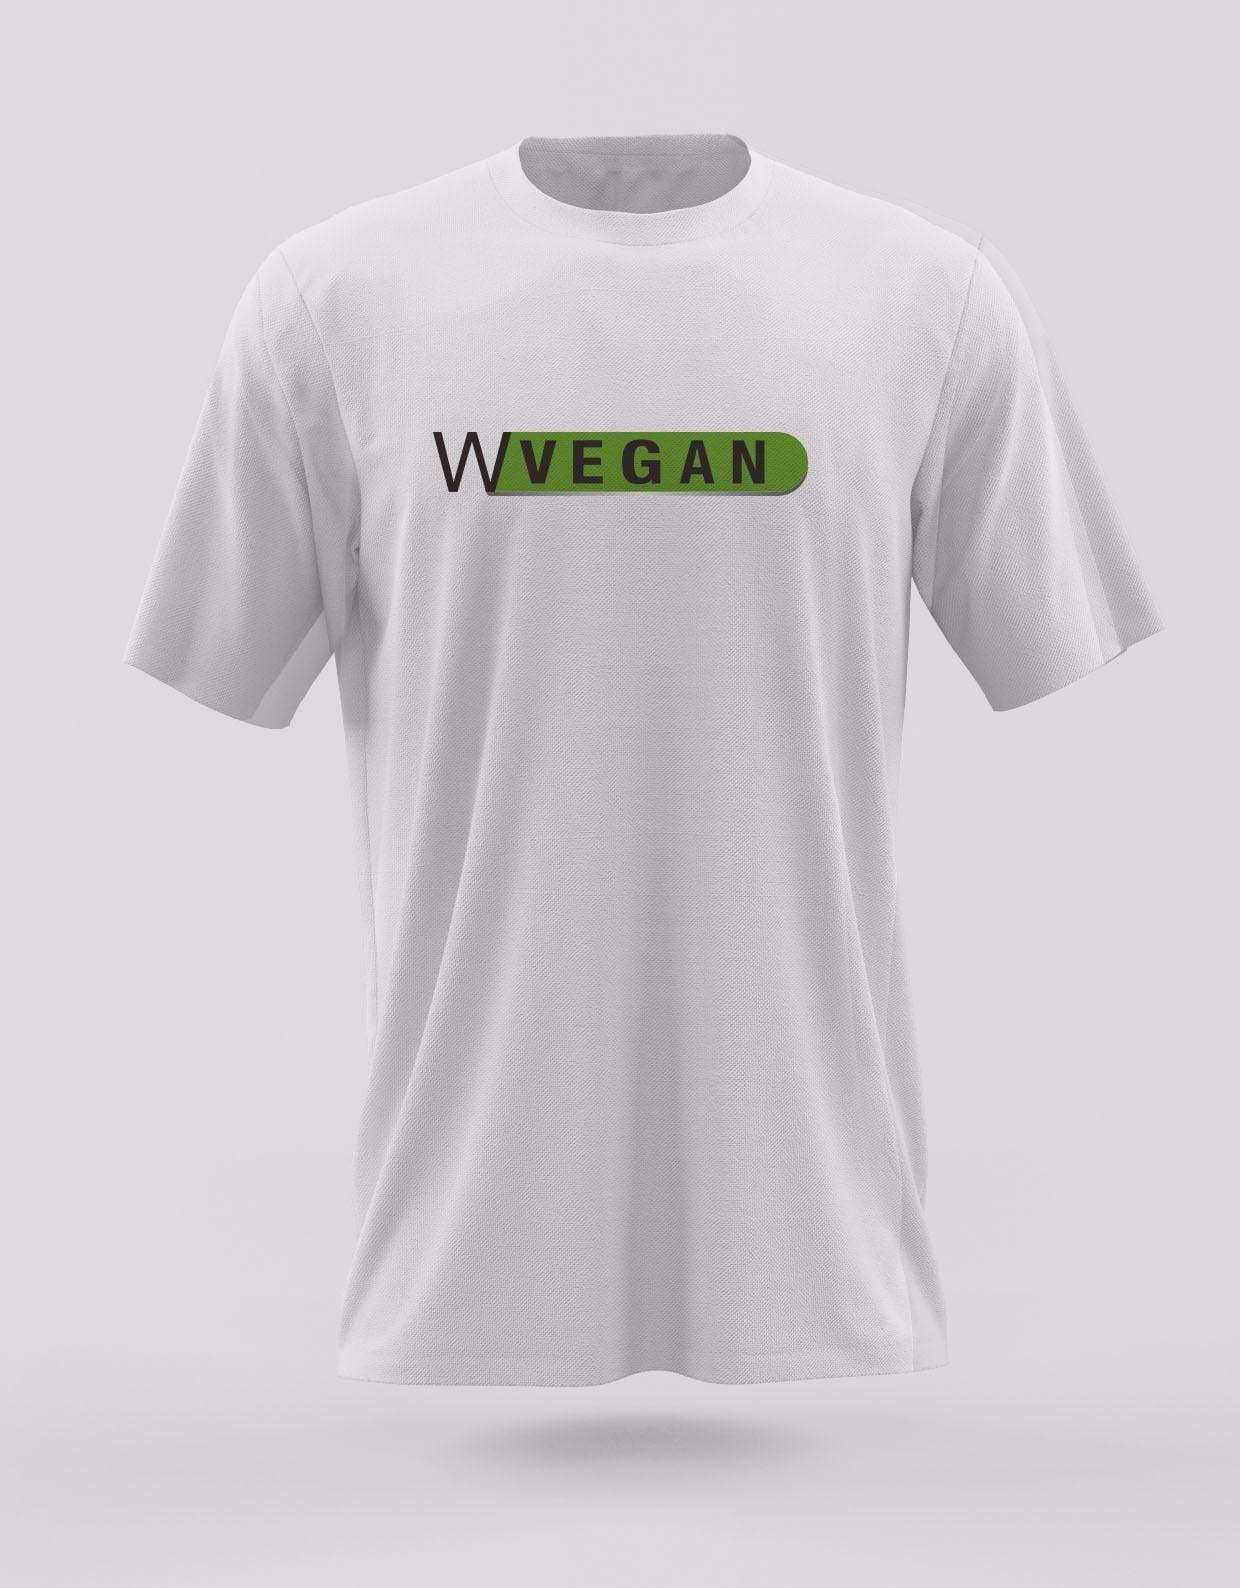 Camiseta Go Vegan WVegan Vegan Tamanhos P , M e G